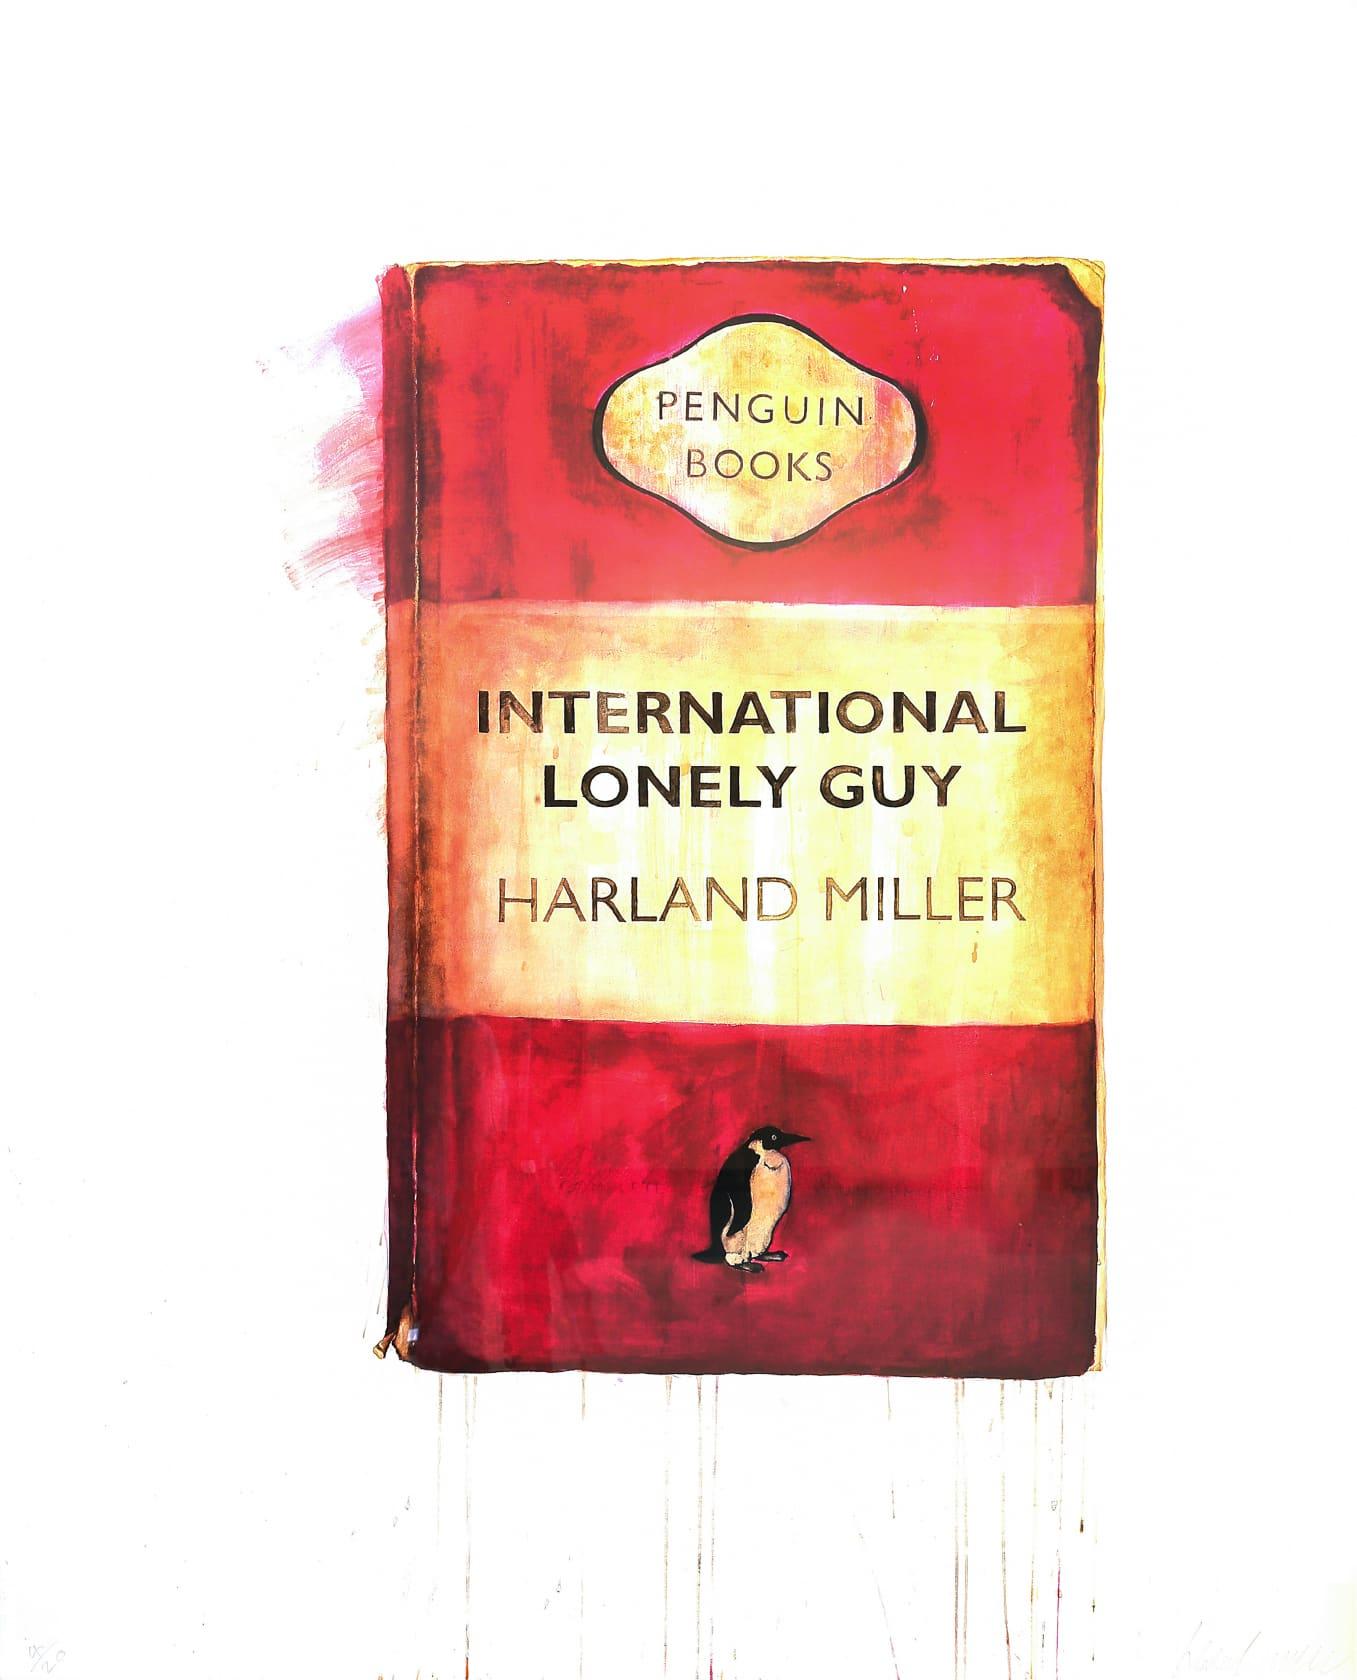 Harland Miller, International Lonely Guy, 2010